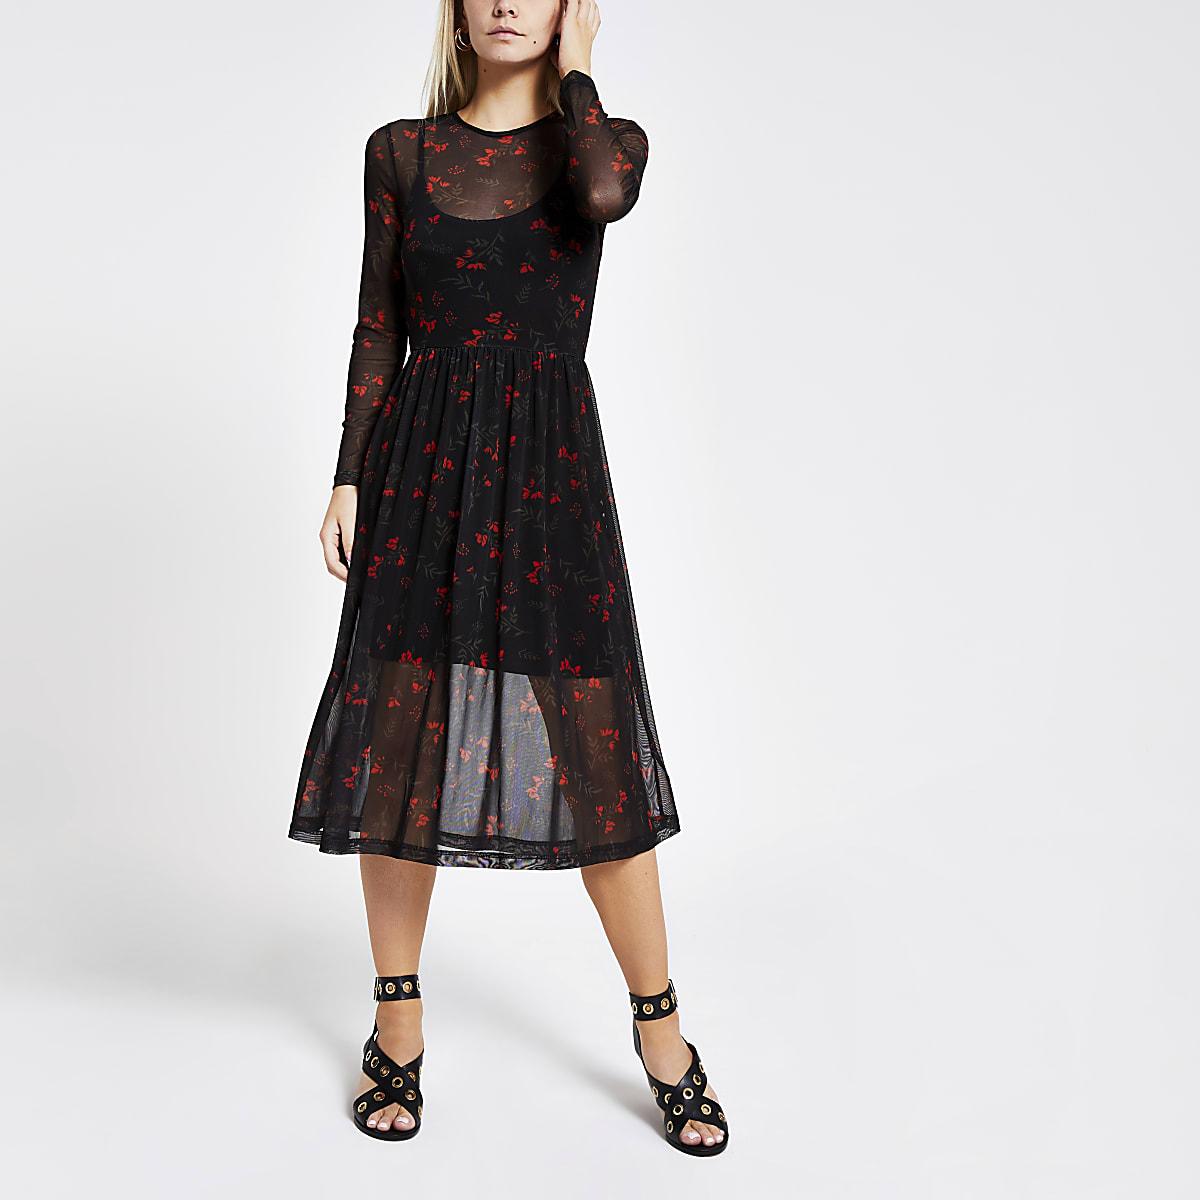 Black floral mesh pleated dress